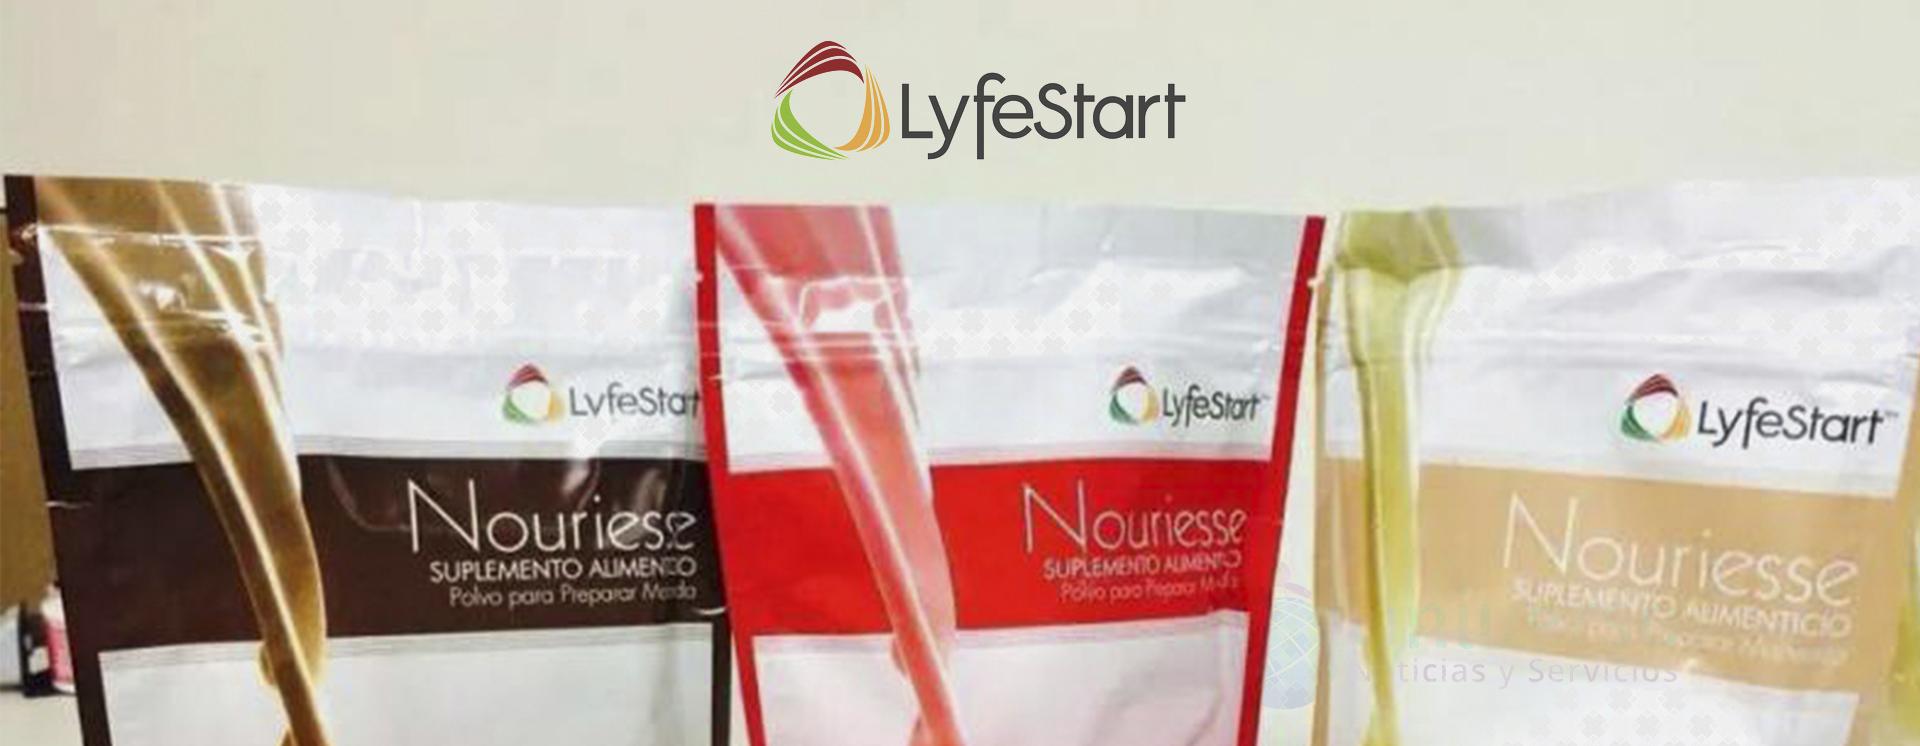 LyfeStart